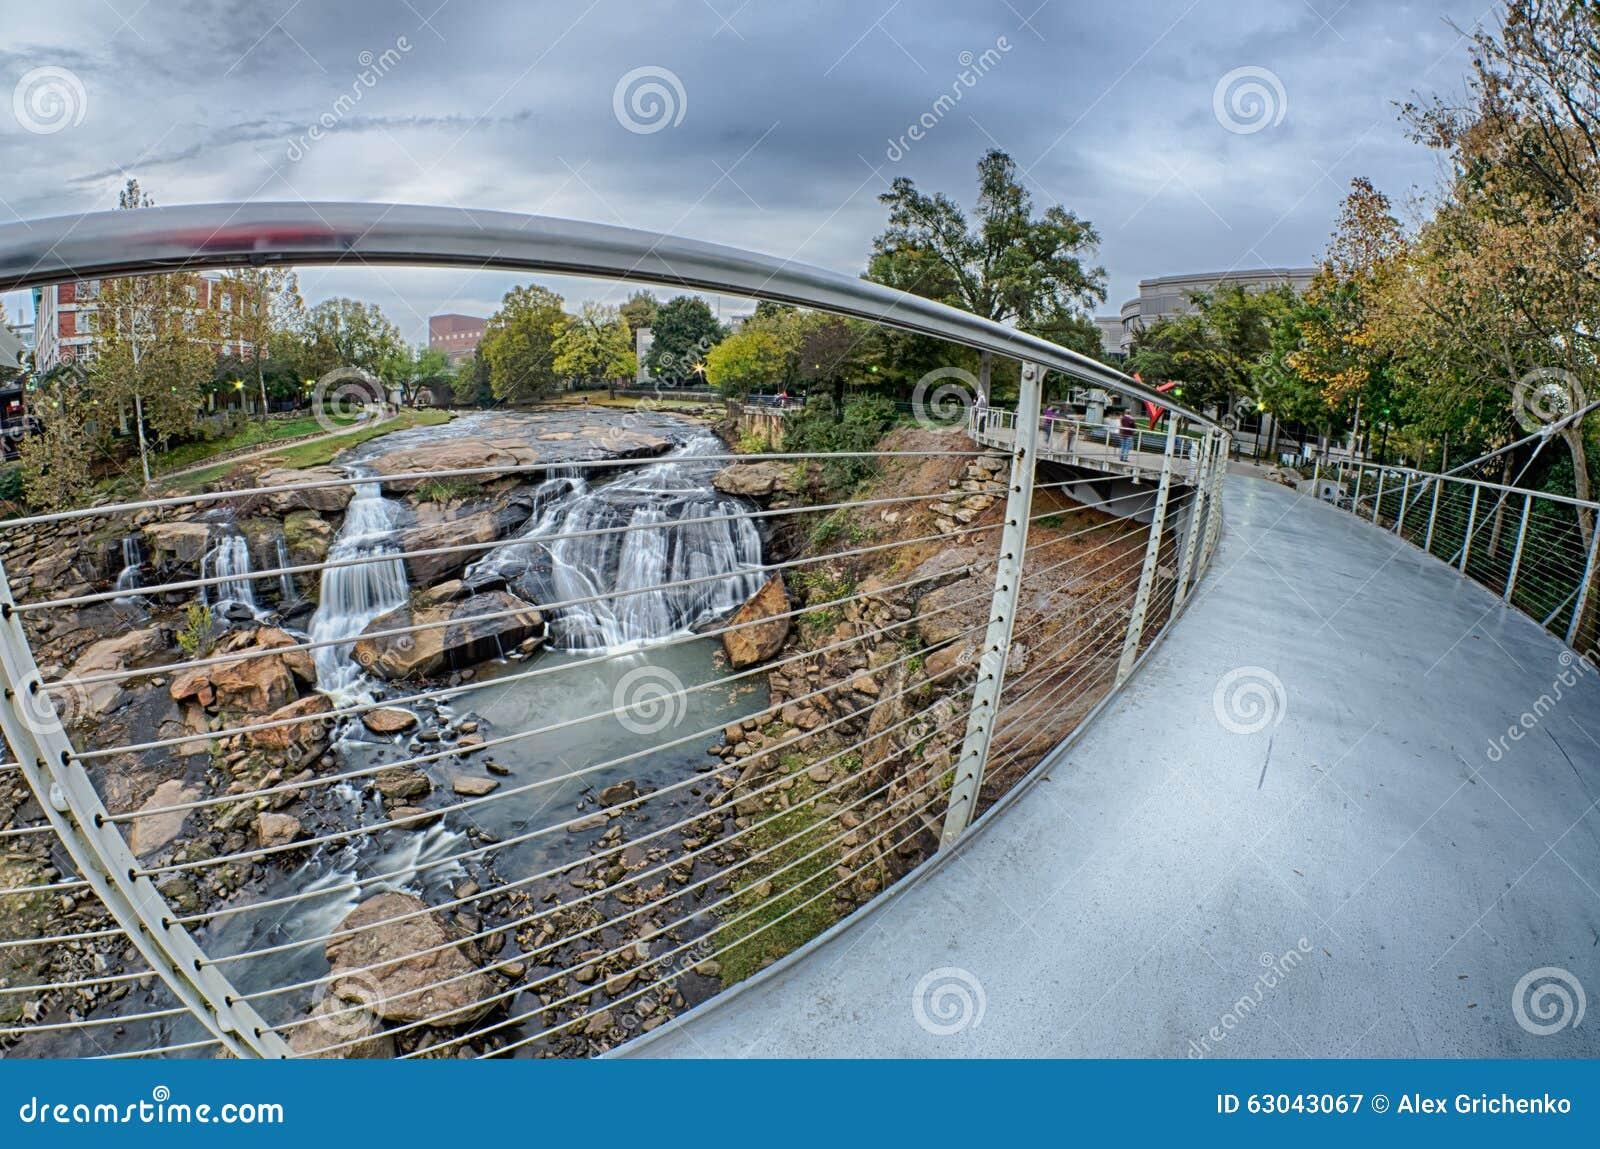 Città di Greenville Carolina del Sud intorno al parco di cadute